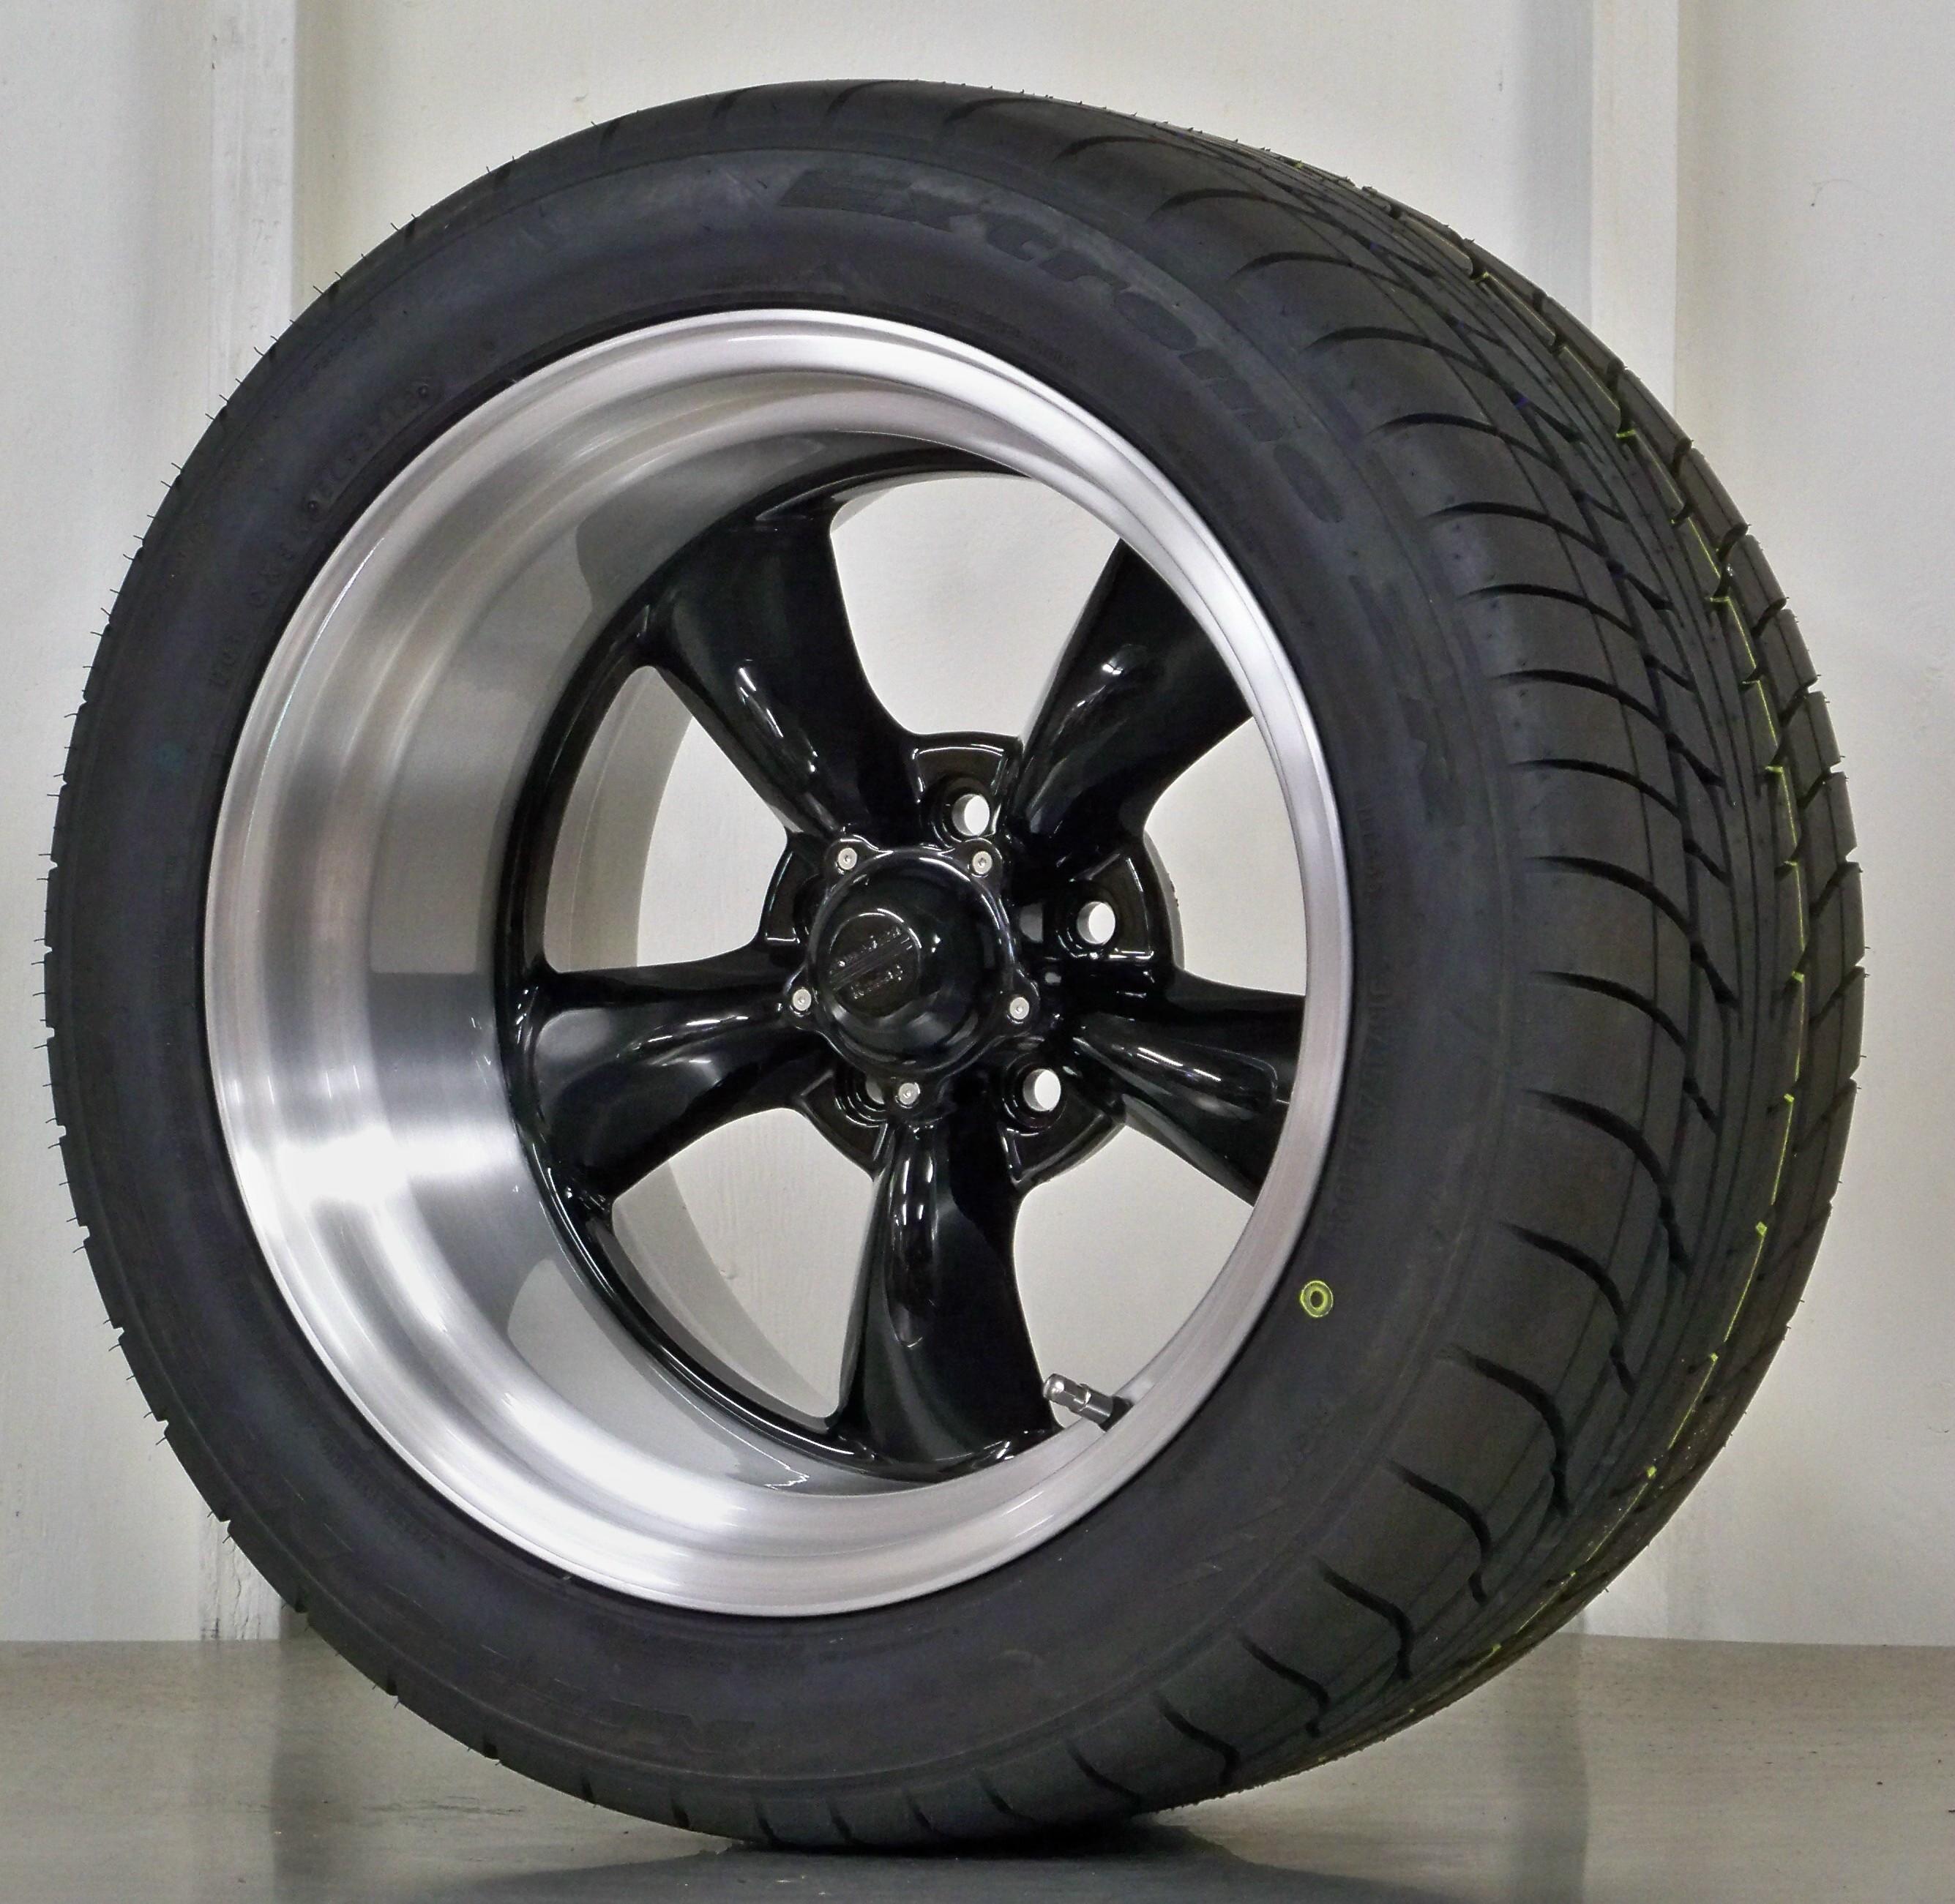 Torq Thrust 11 17 Brushed Black Nt555 Vintage Wheels